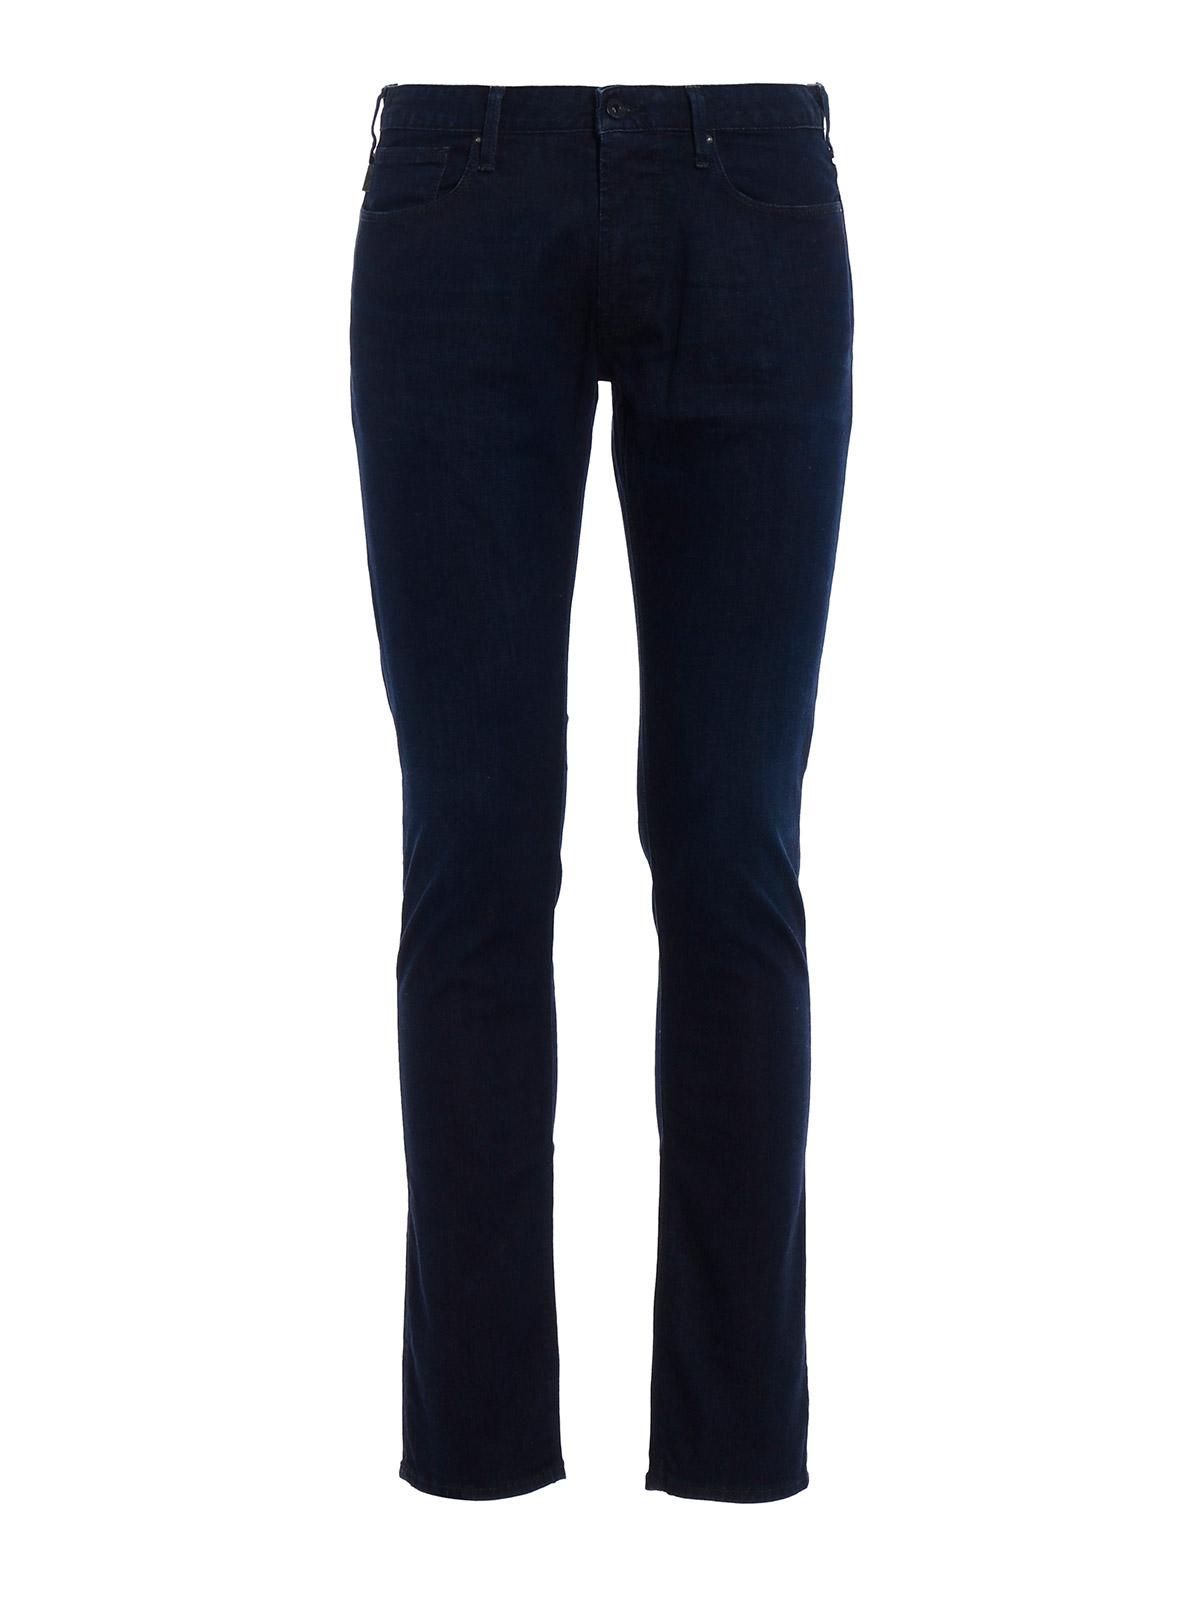 Picture of EMPORIO ARMANI | Men's J06 Slim Fit Jeans